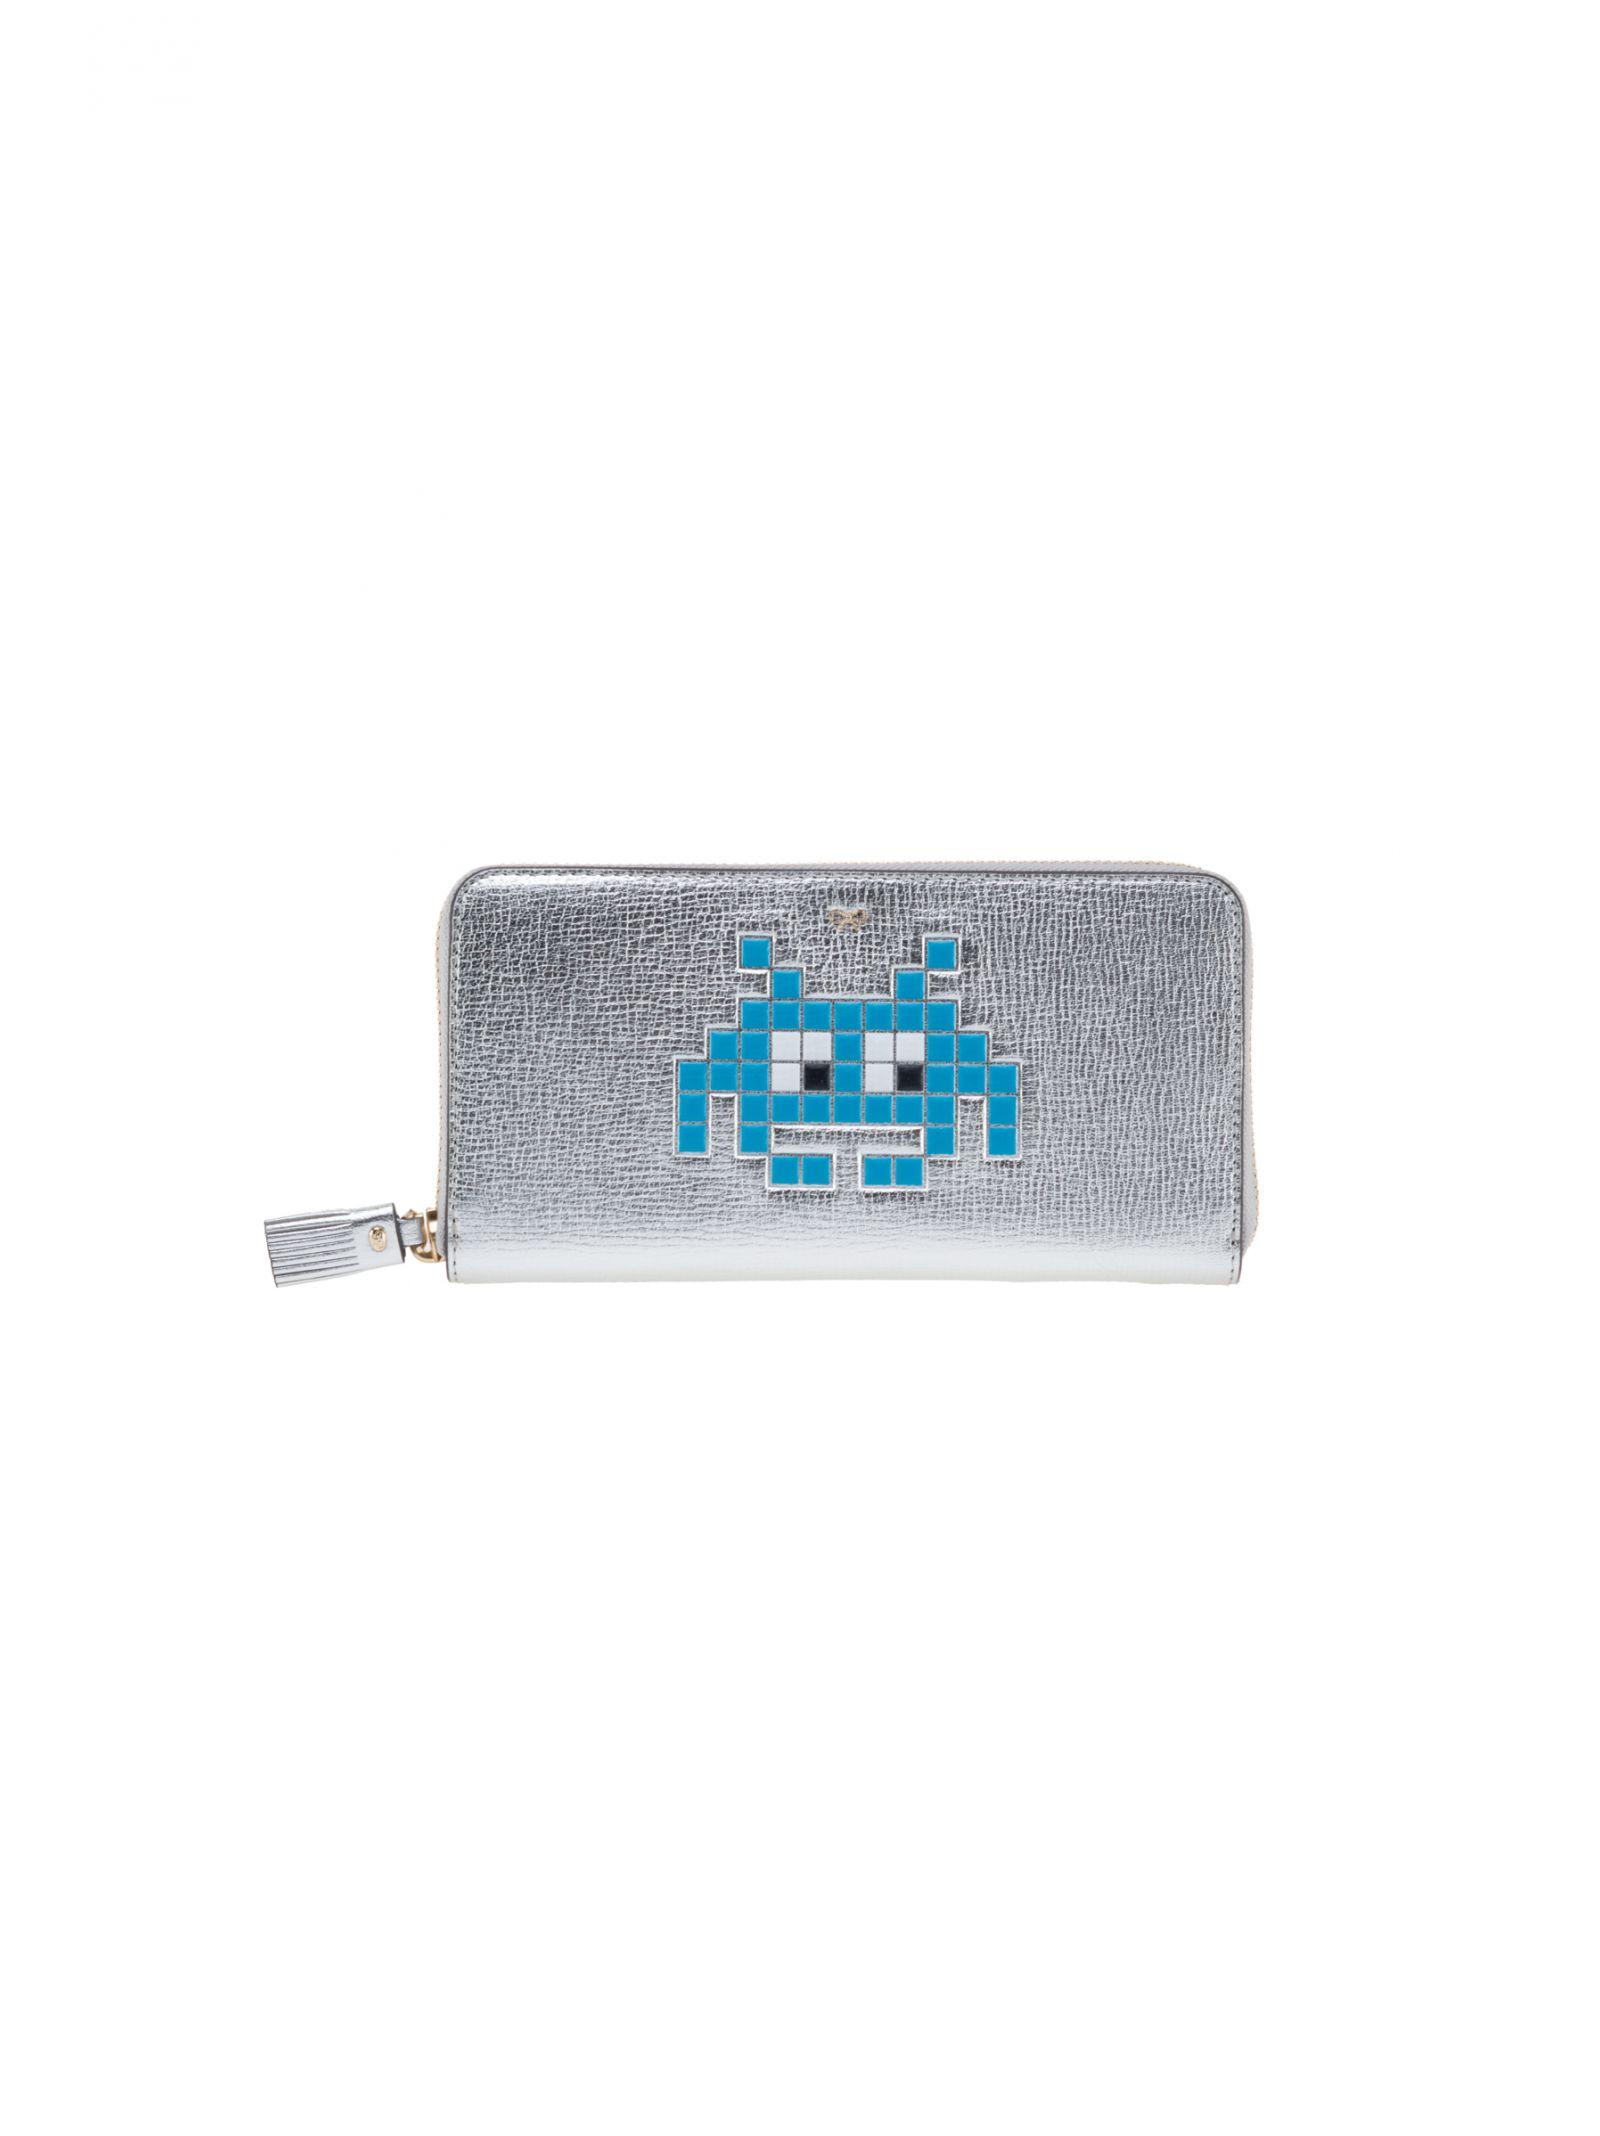 Anya Hindmarch Space Invader Wallet